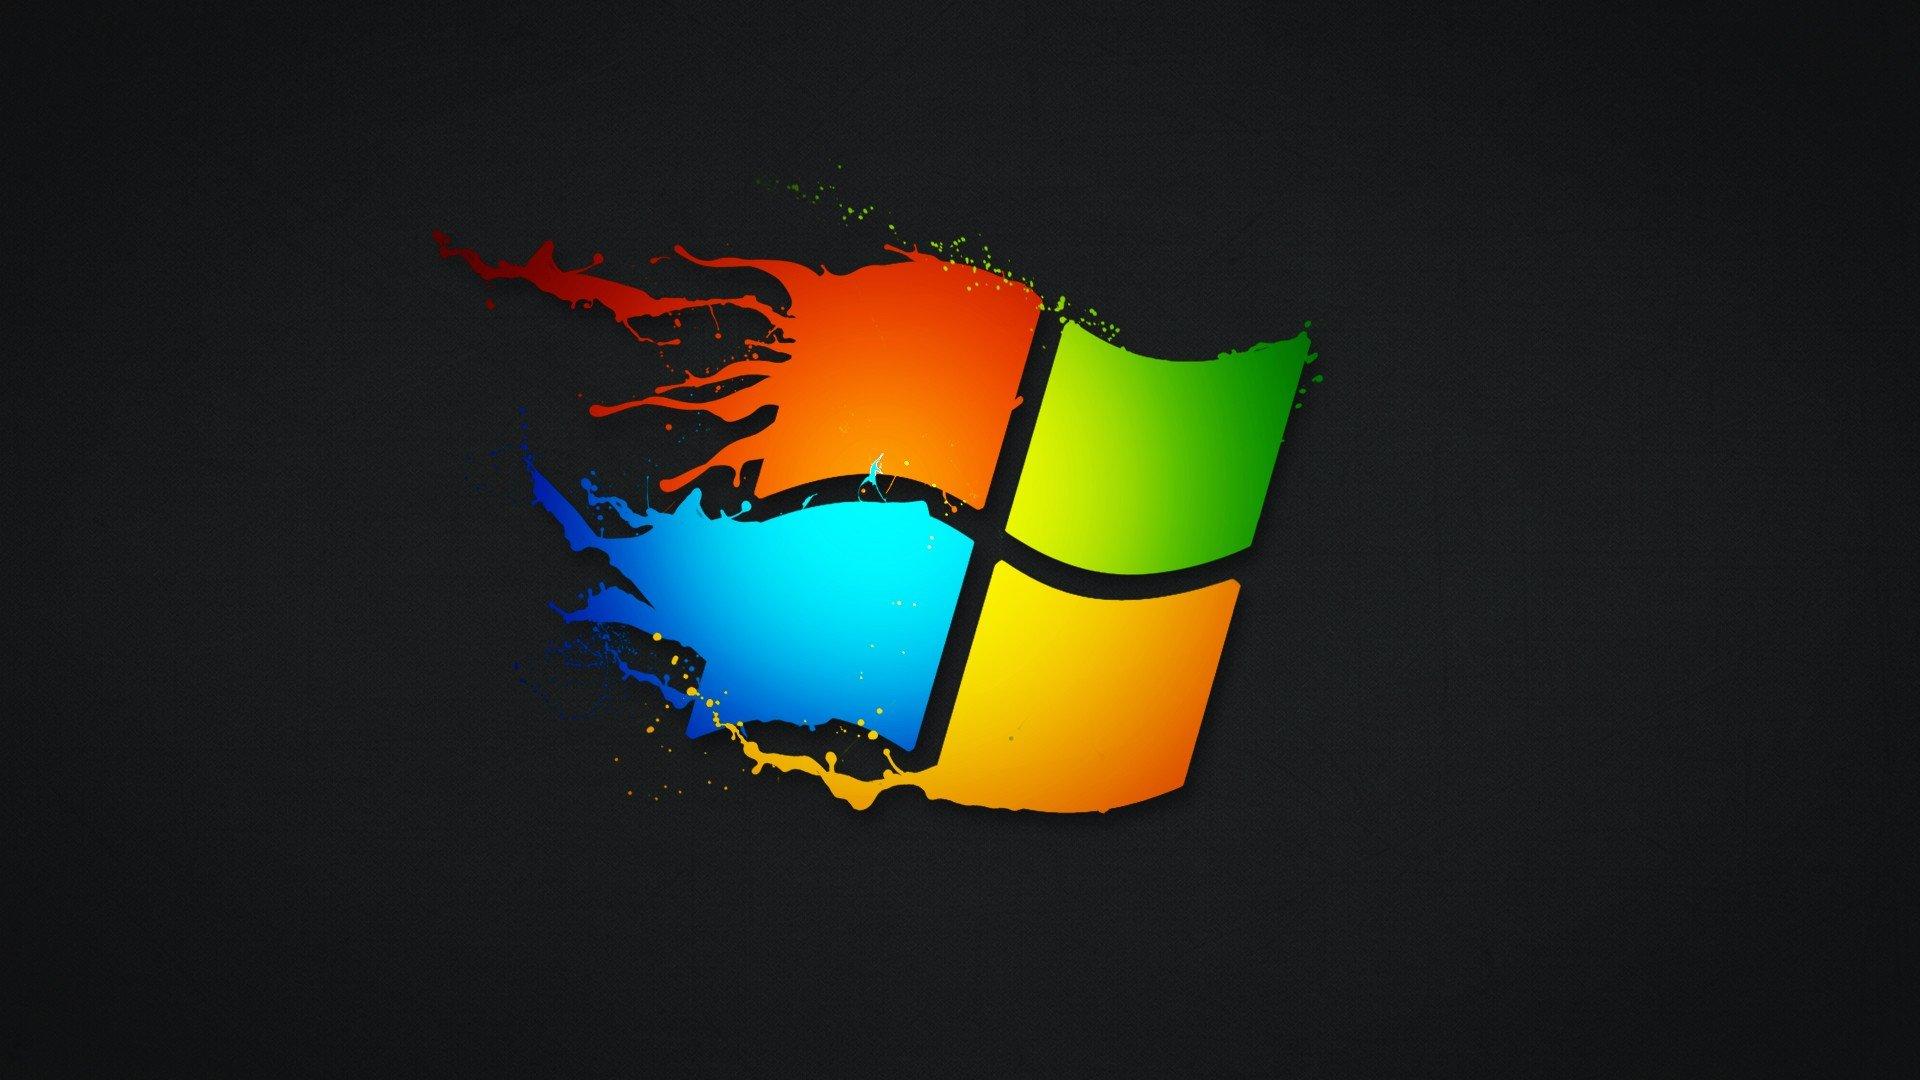 Wallpaper 1920x1080 Px Microsoft Windows Paint Splatter